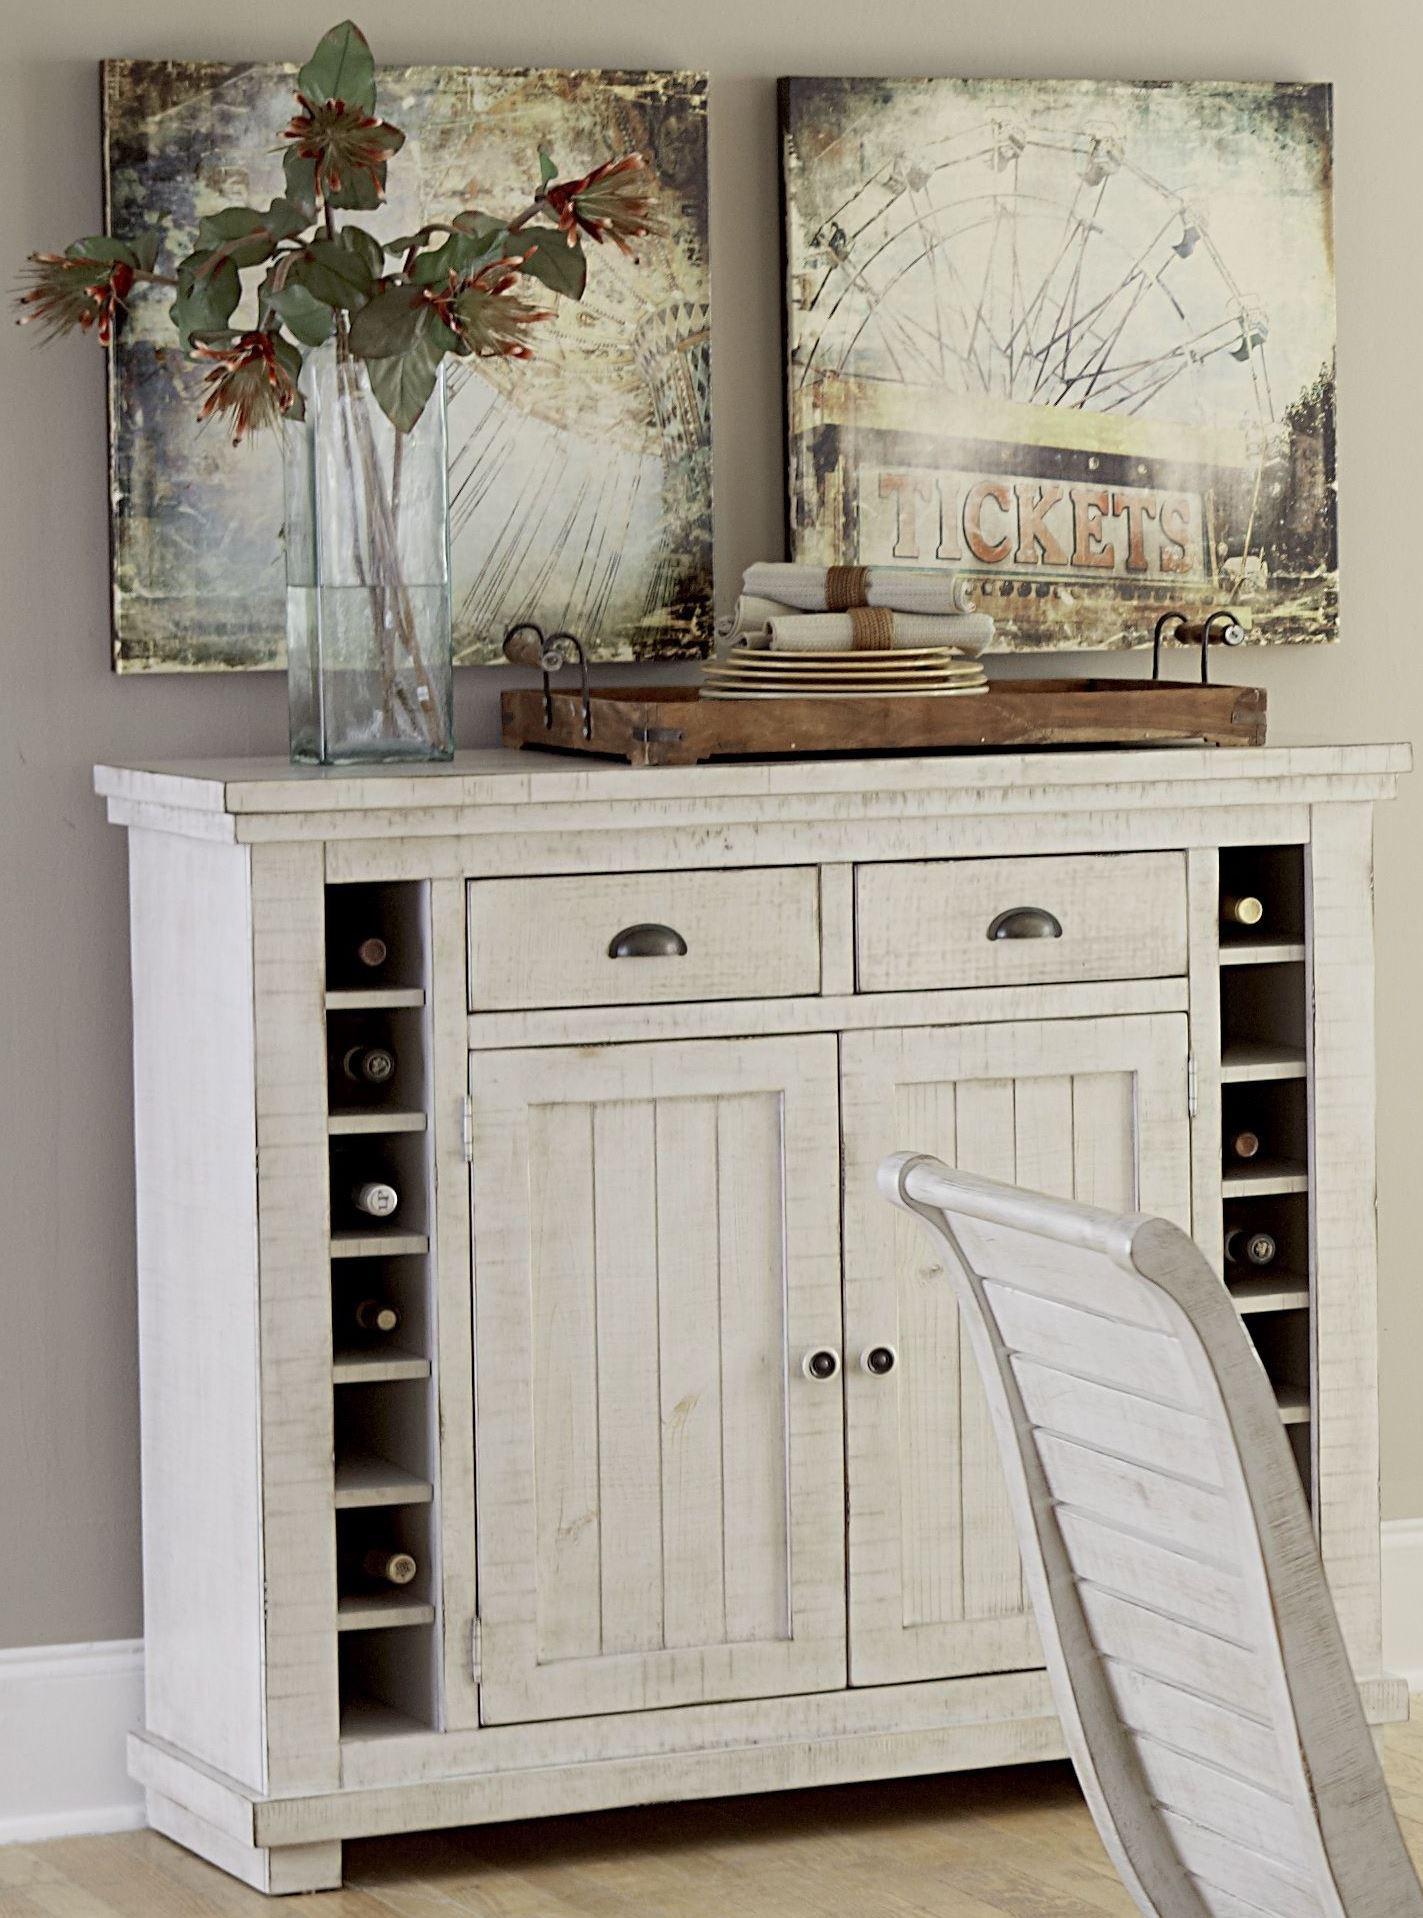 Willow Distressed White Slat Bedroom Set: Willow Distressed White Server From Progressive Furniture